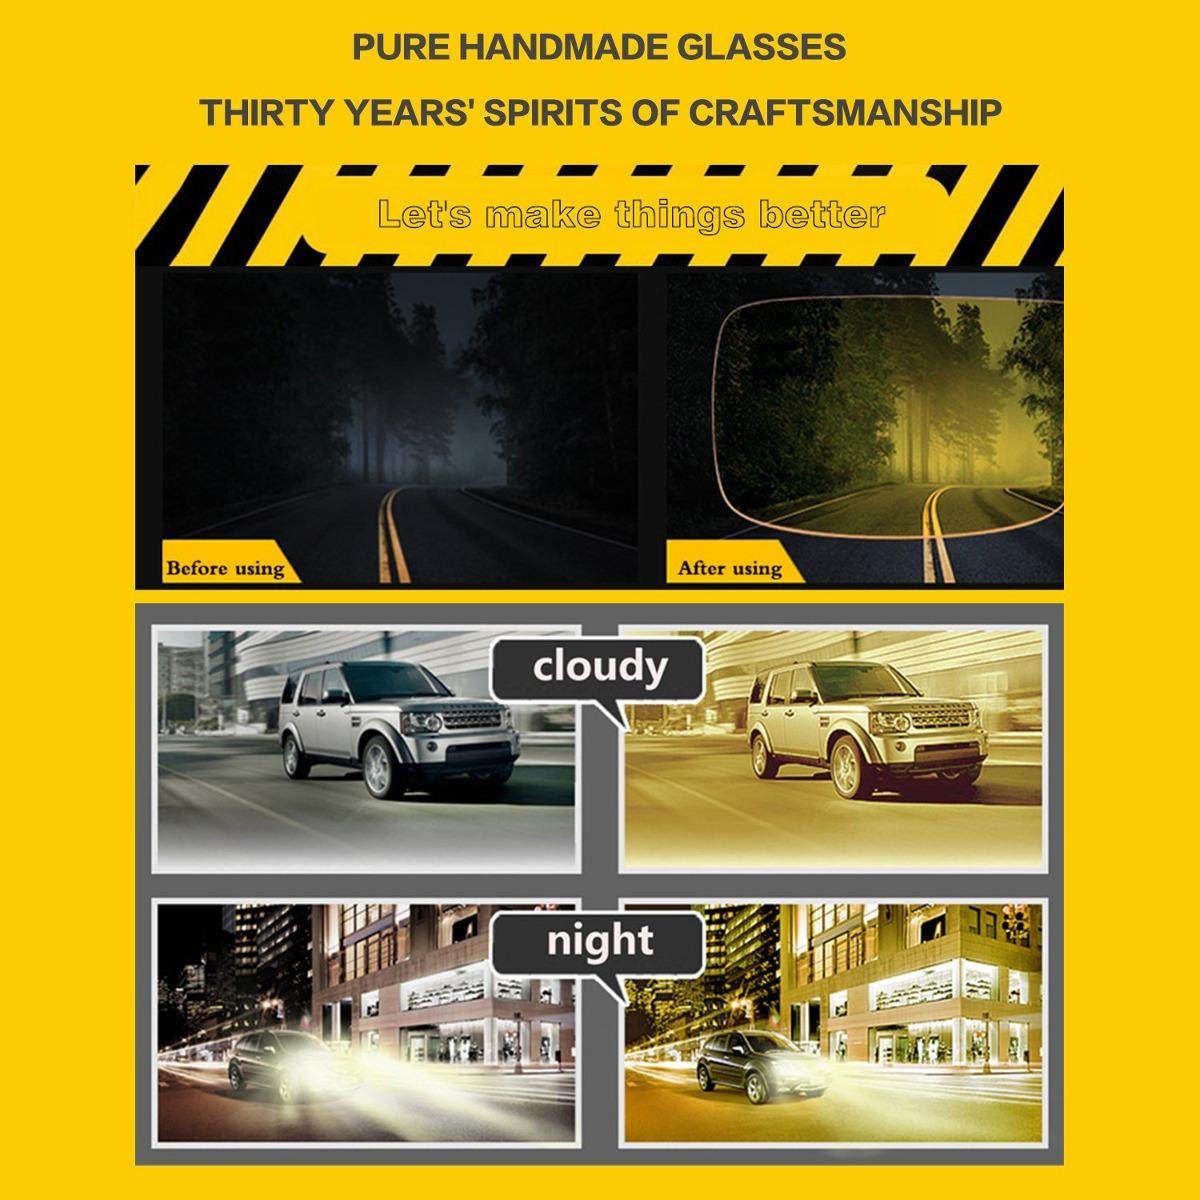 d4edbb1df33 soxick night driving polarized glasses para hombres muj... Cargando zoom.